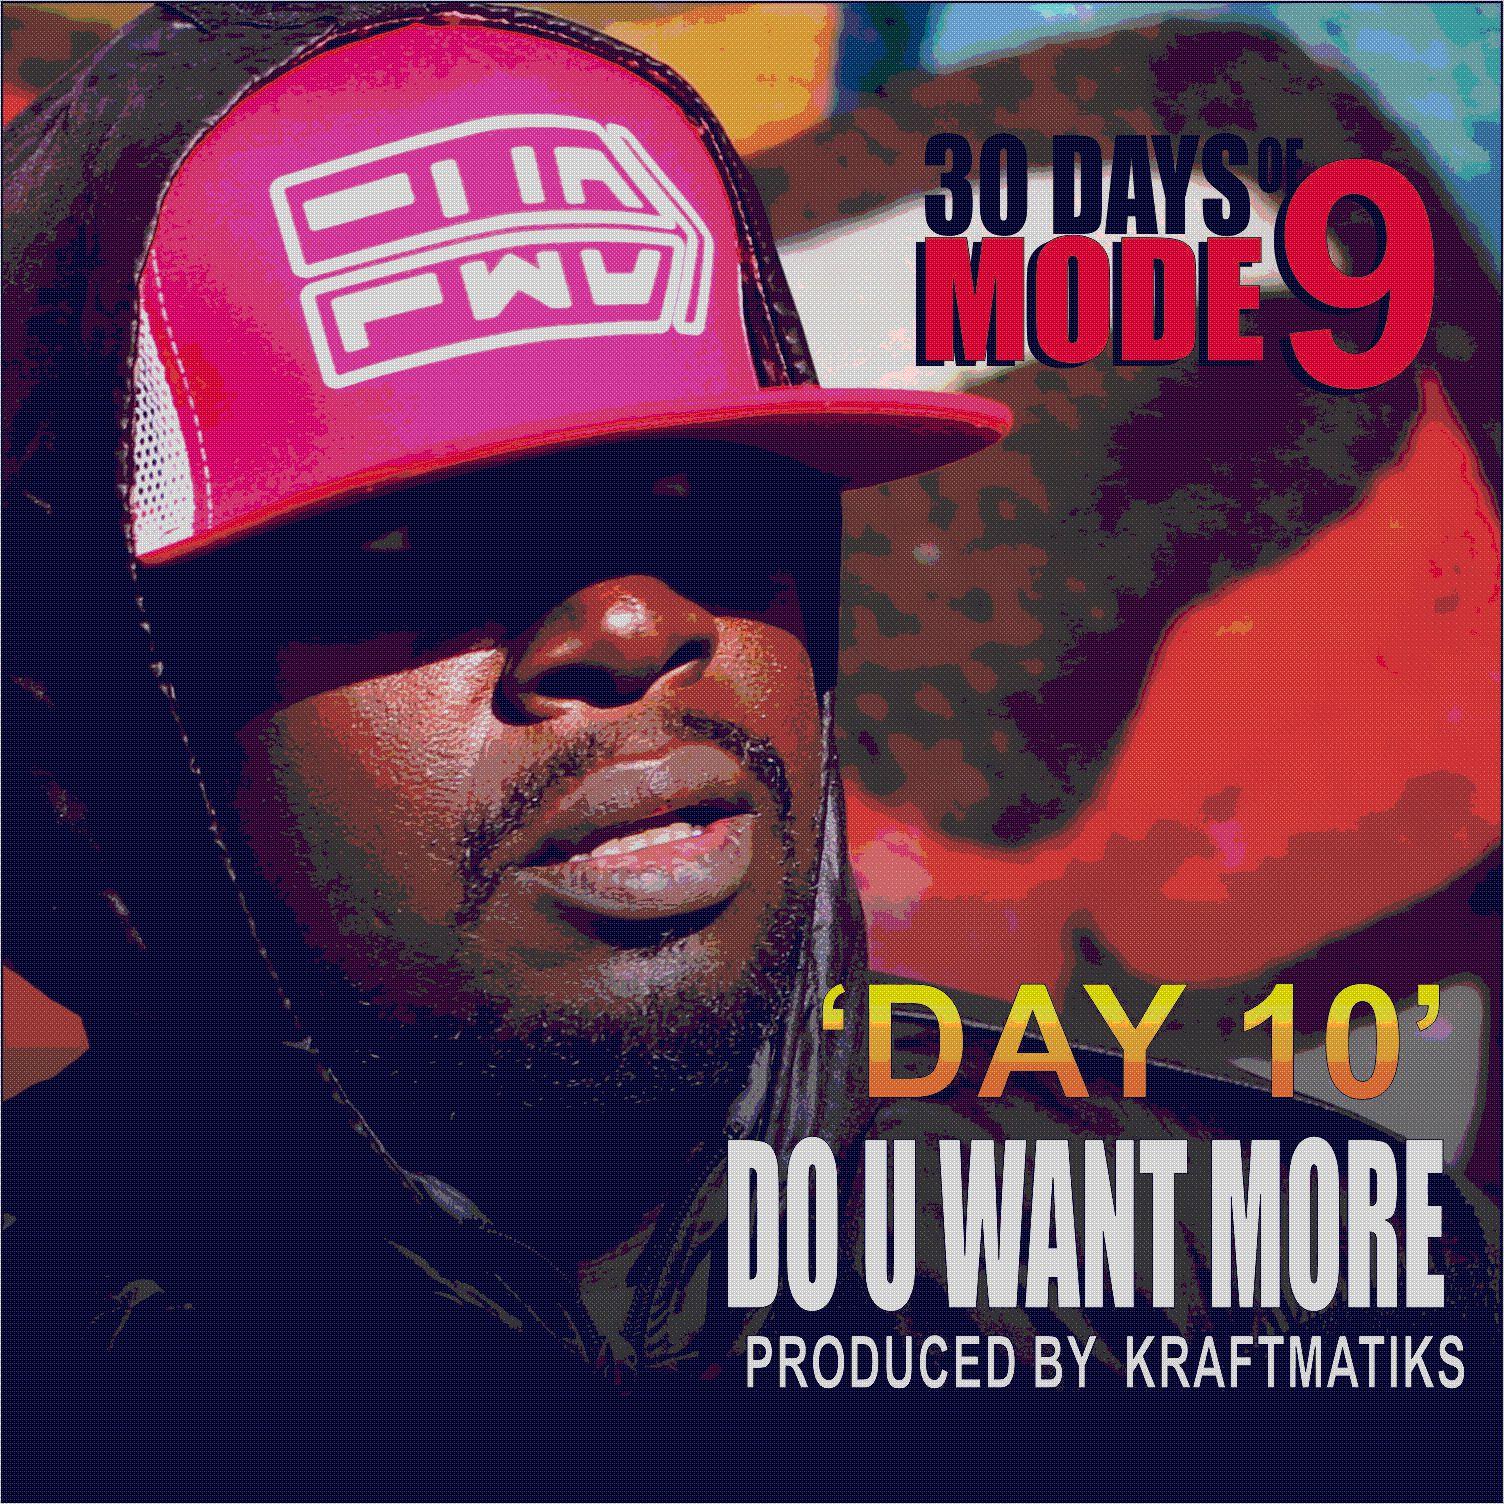 Modenine - DAY-10